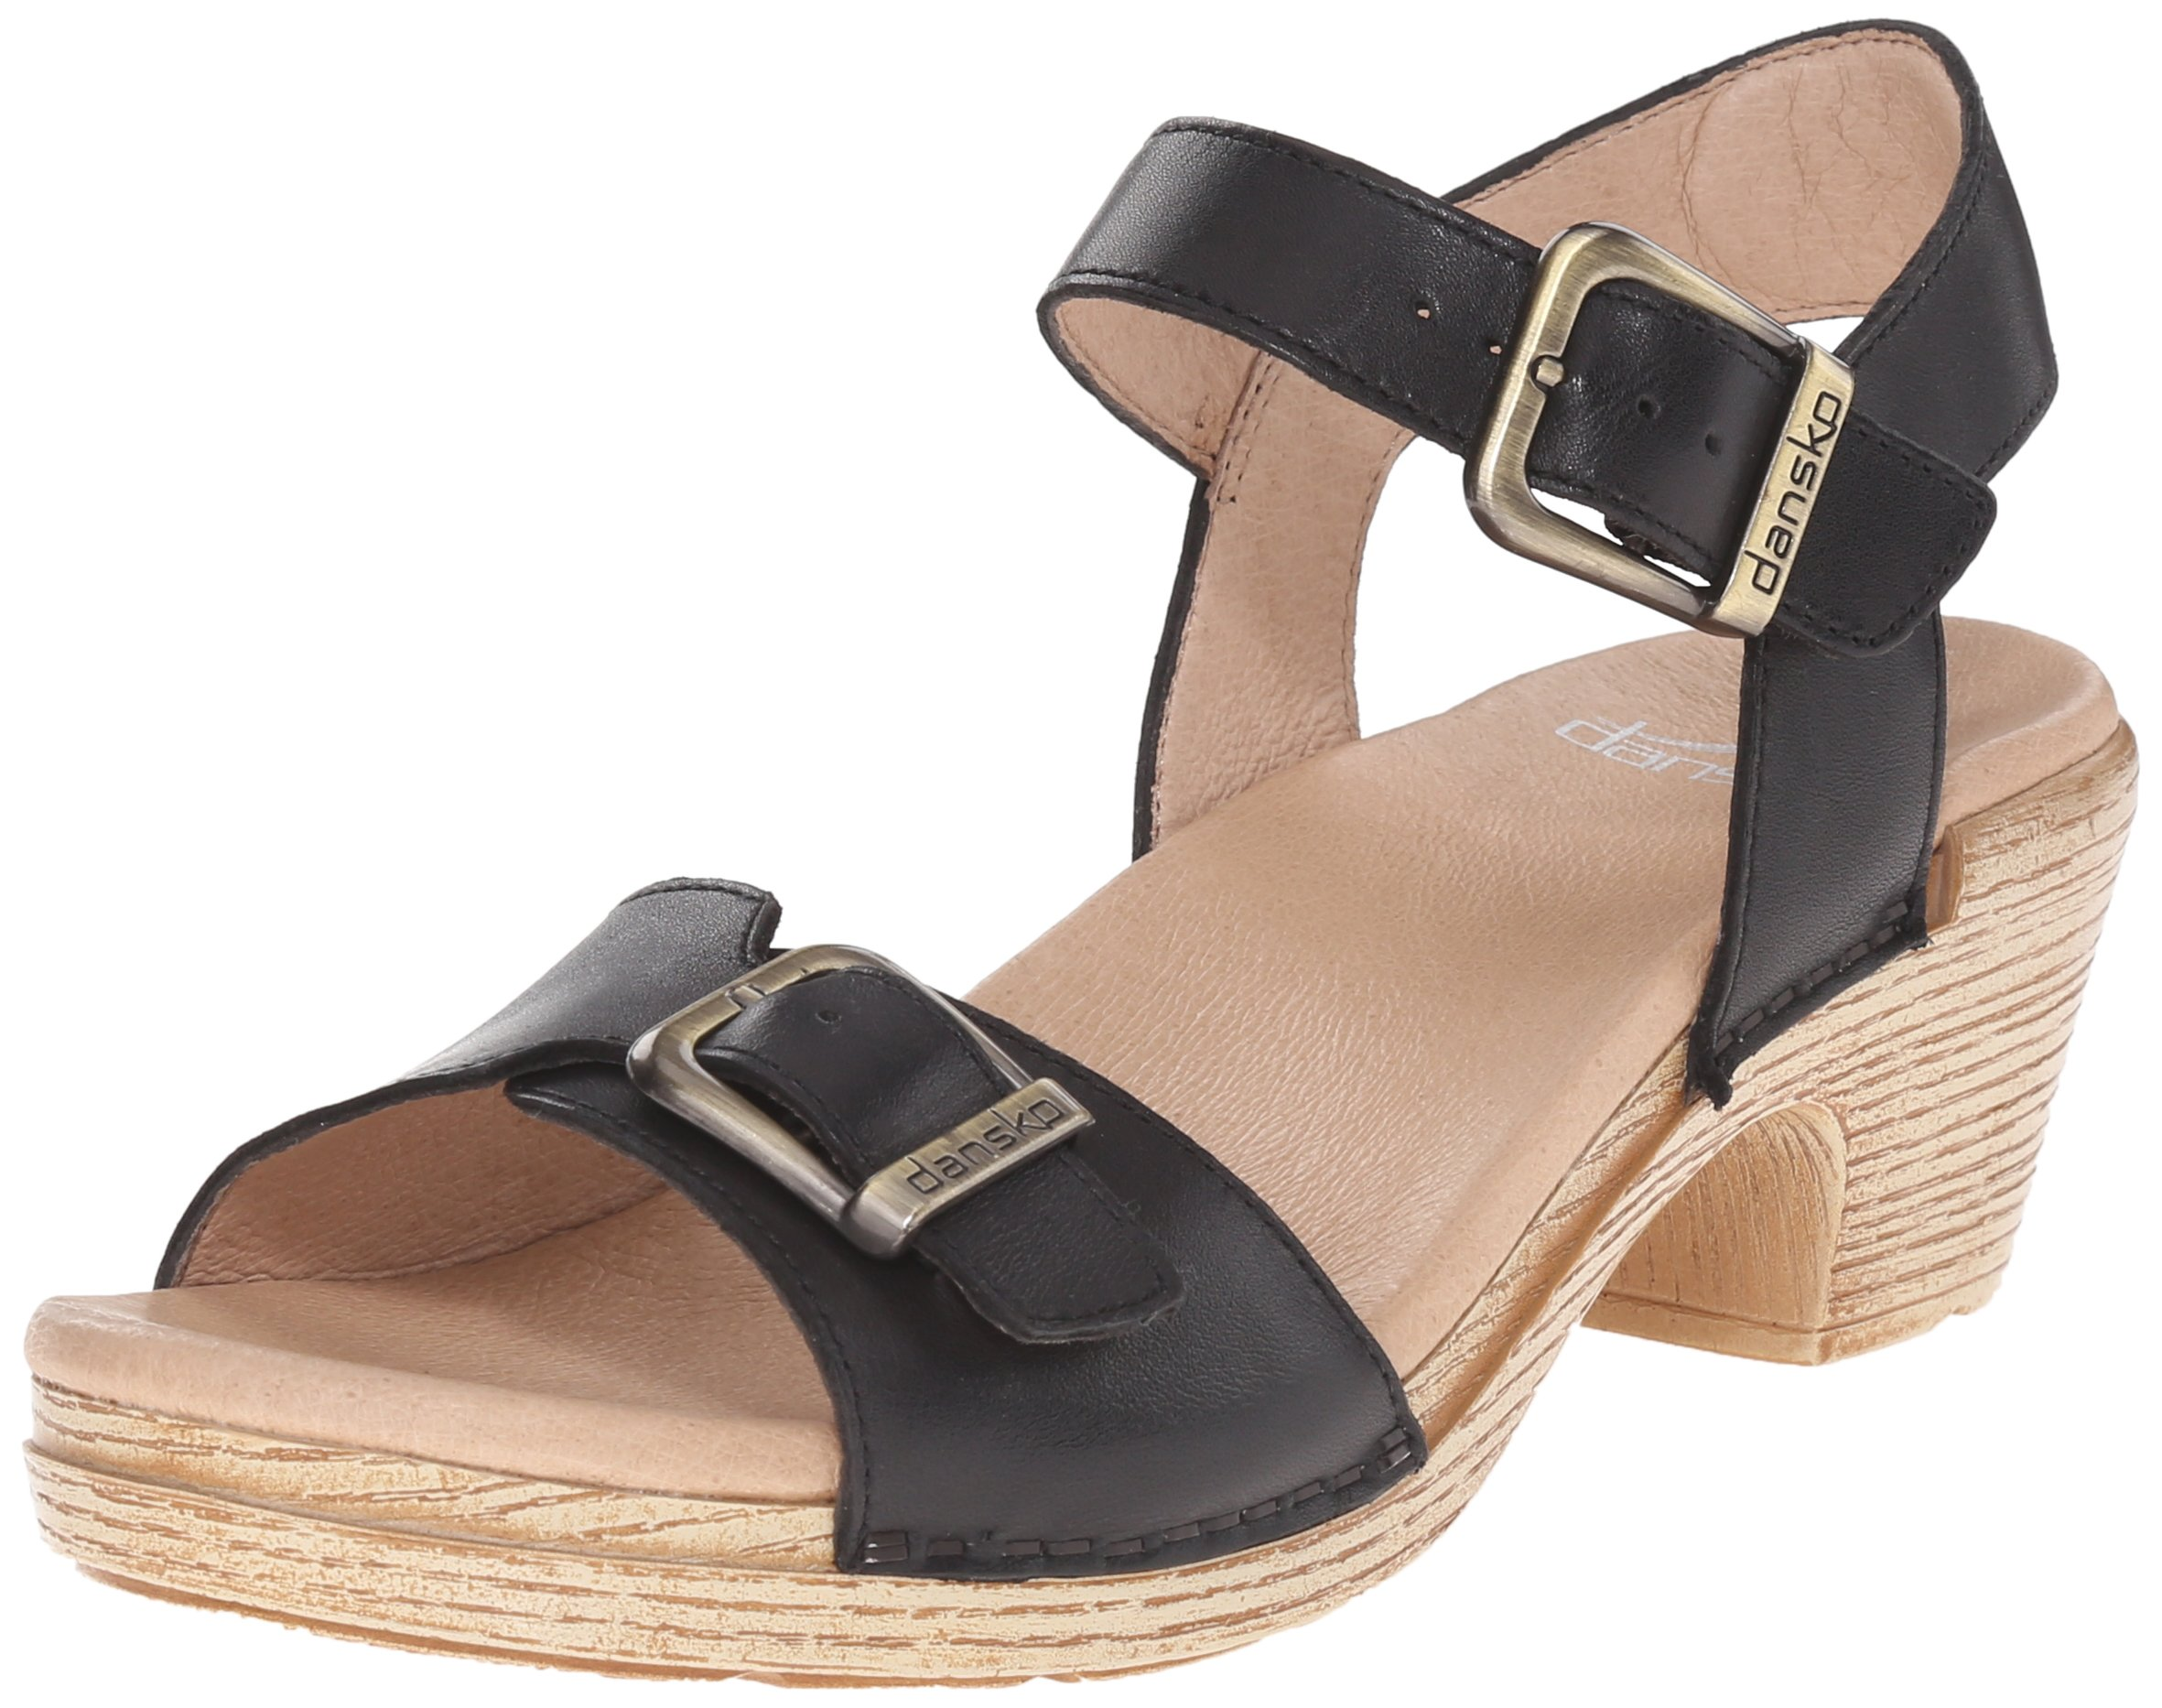 Dansko Women's Matty Heeled Sandal, Black Full Grain, 41 EU/10.5-11 M US